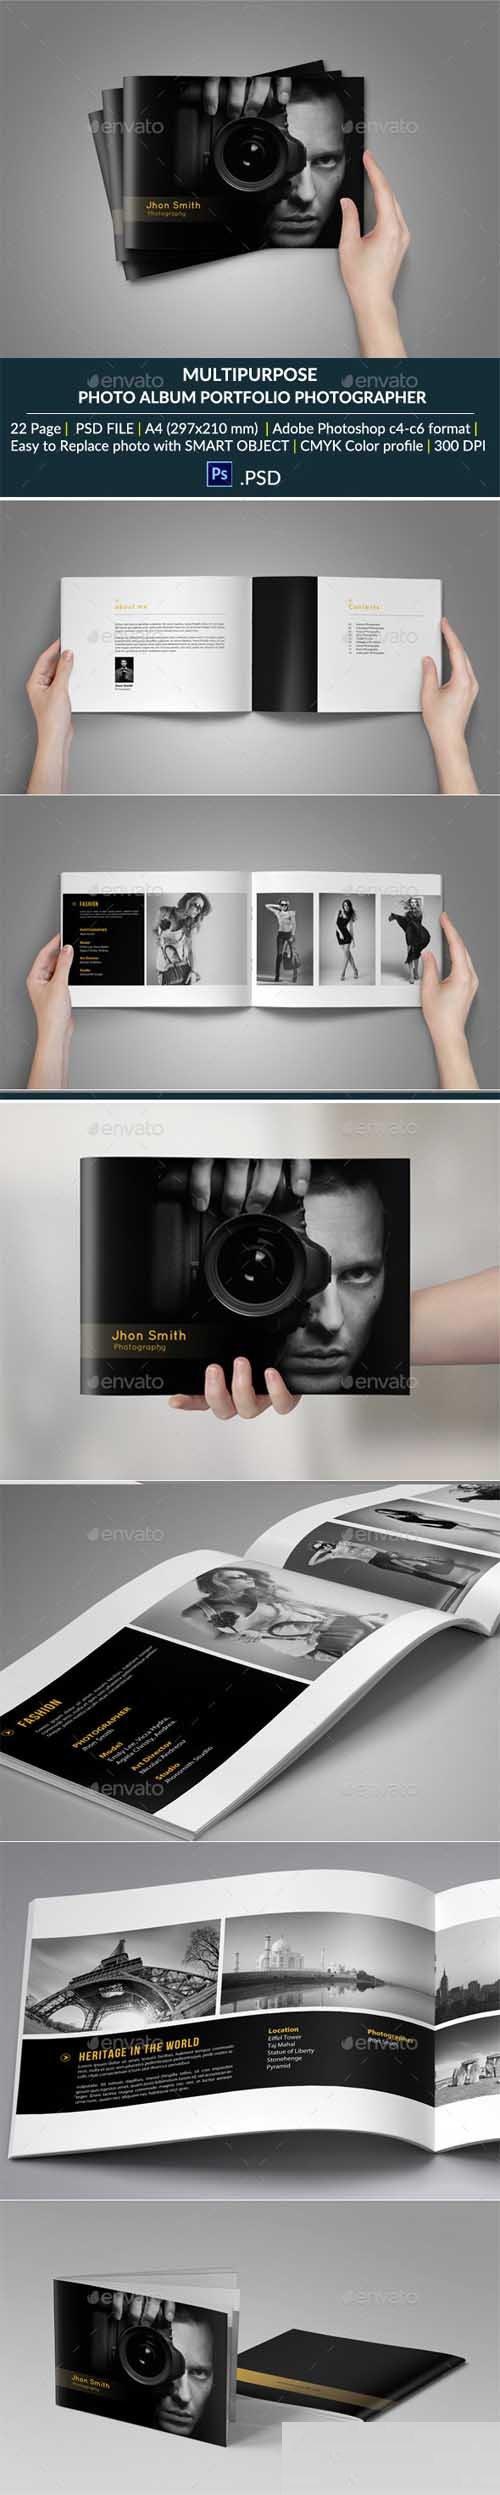 Portfolio-Photographer-9448257